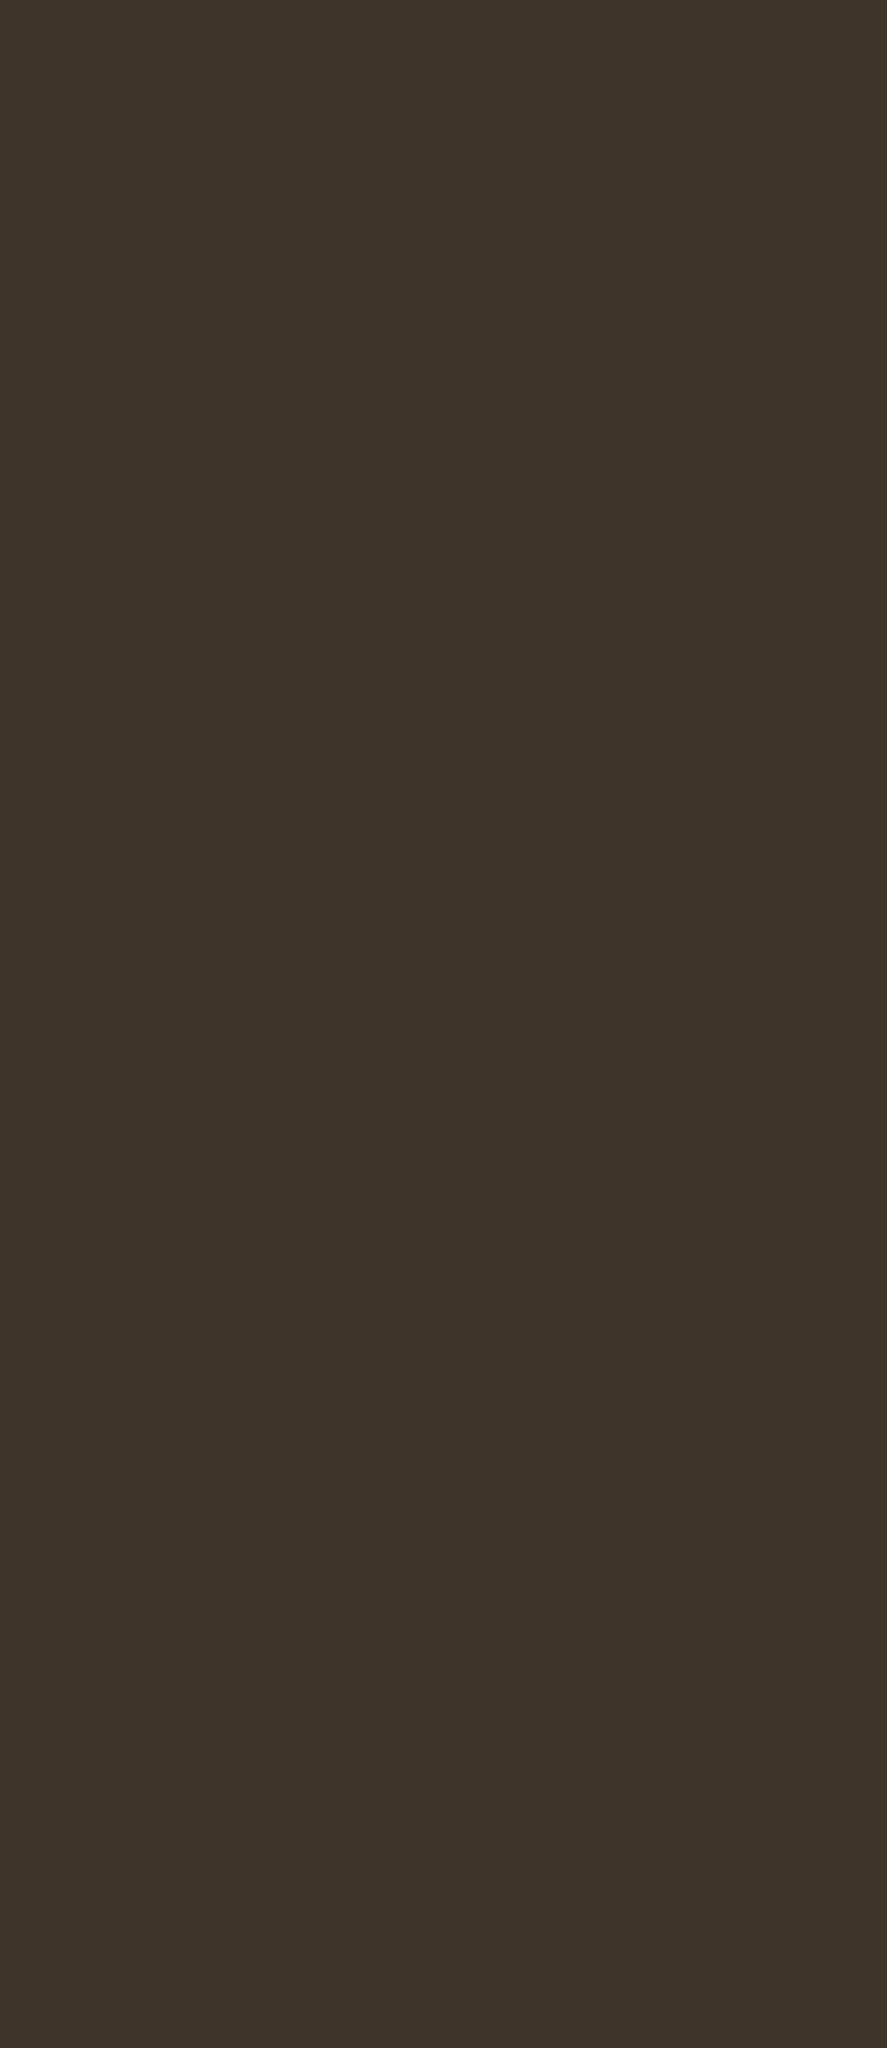 0547 CHOCOLATE